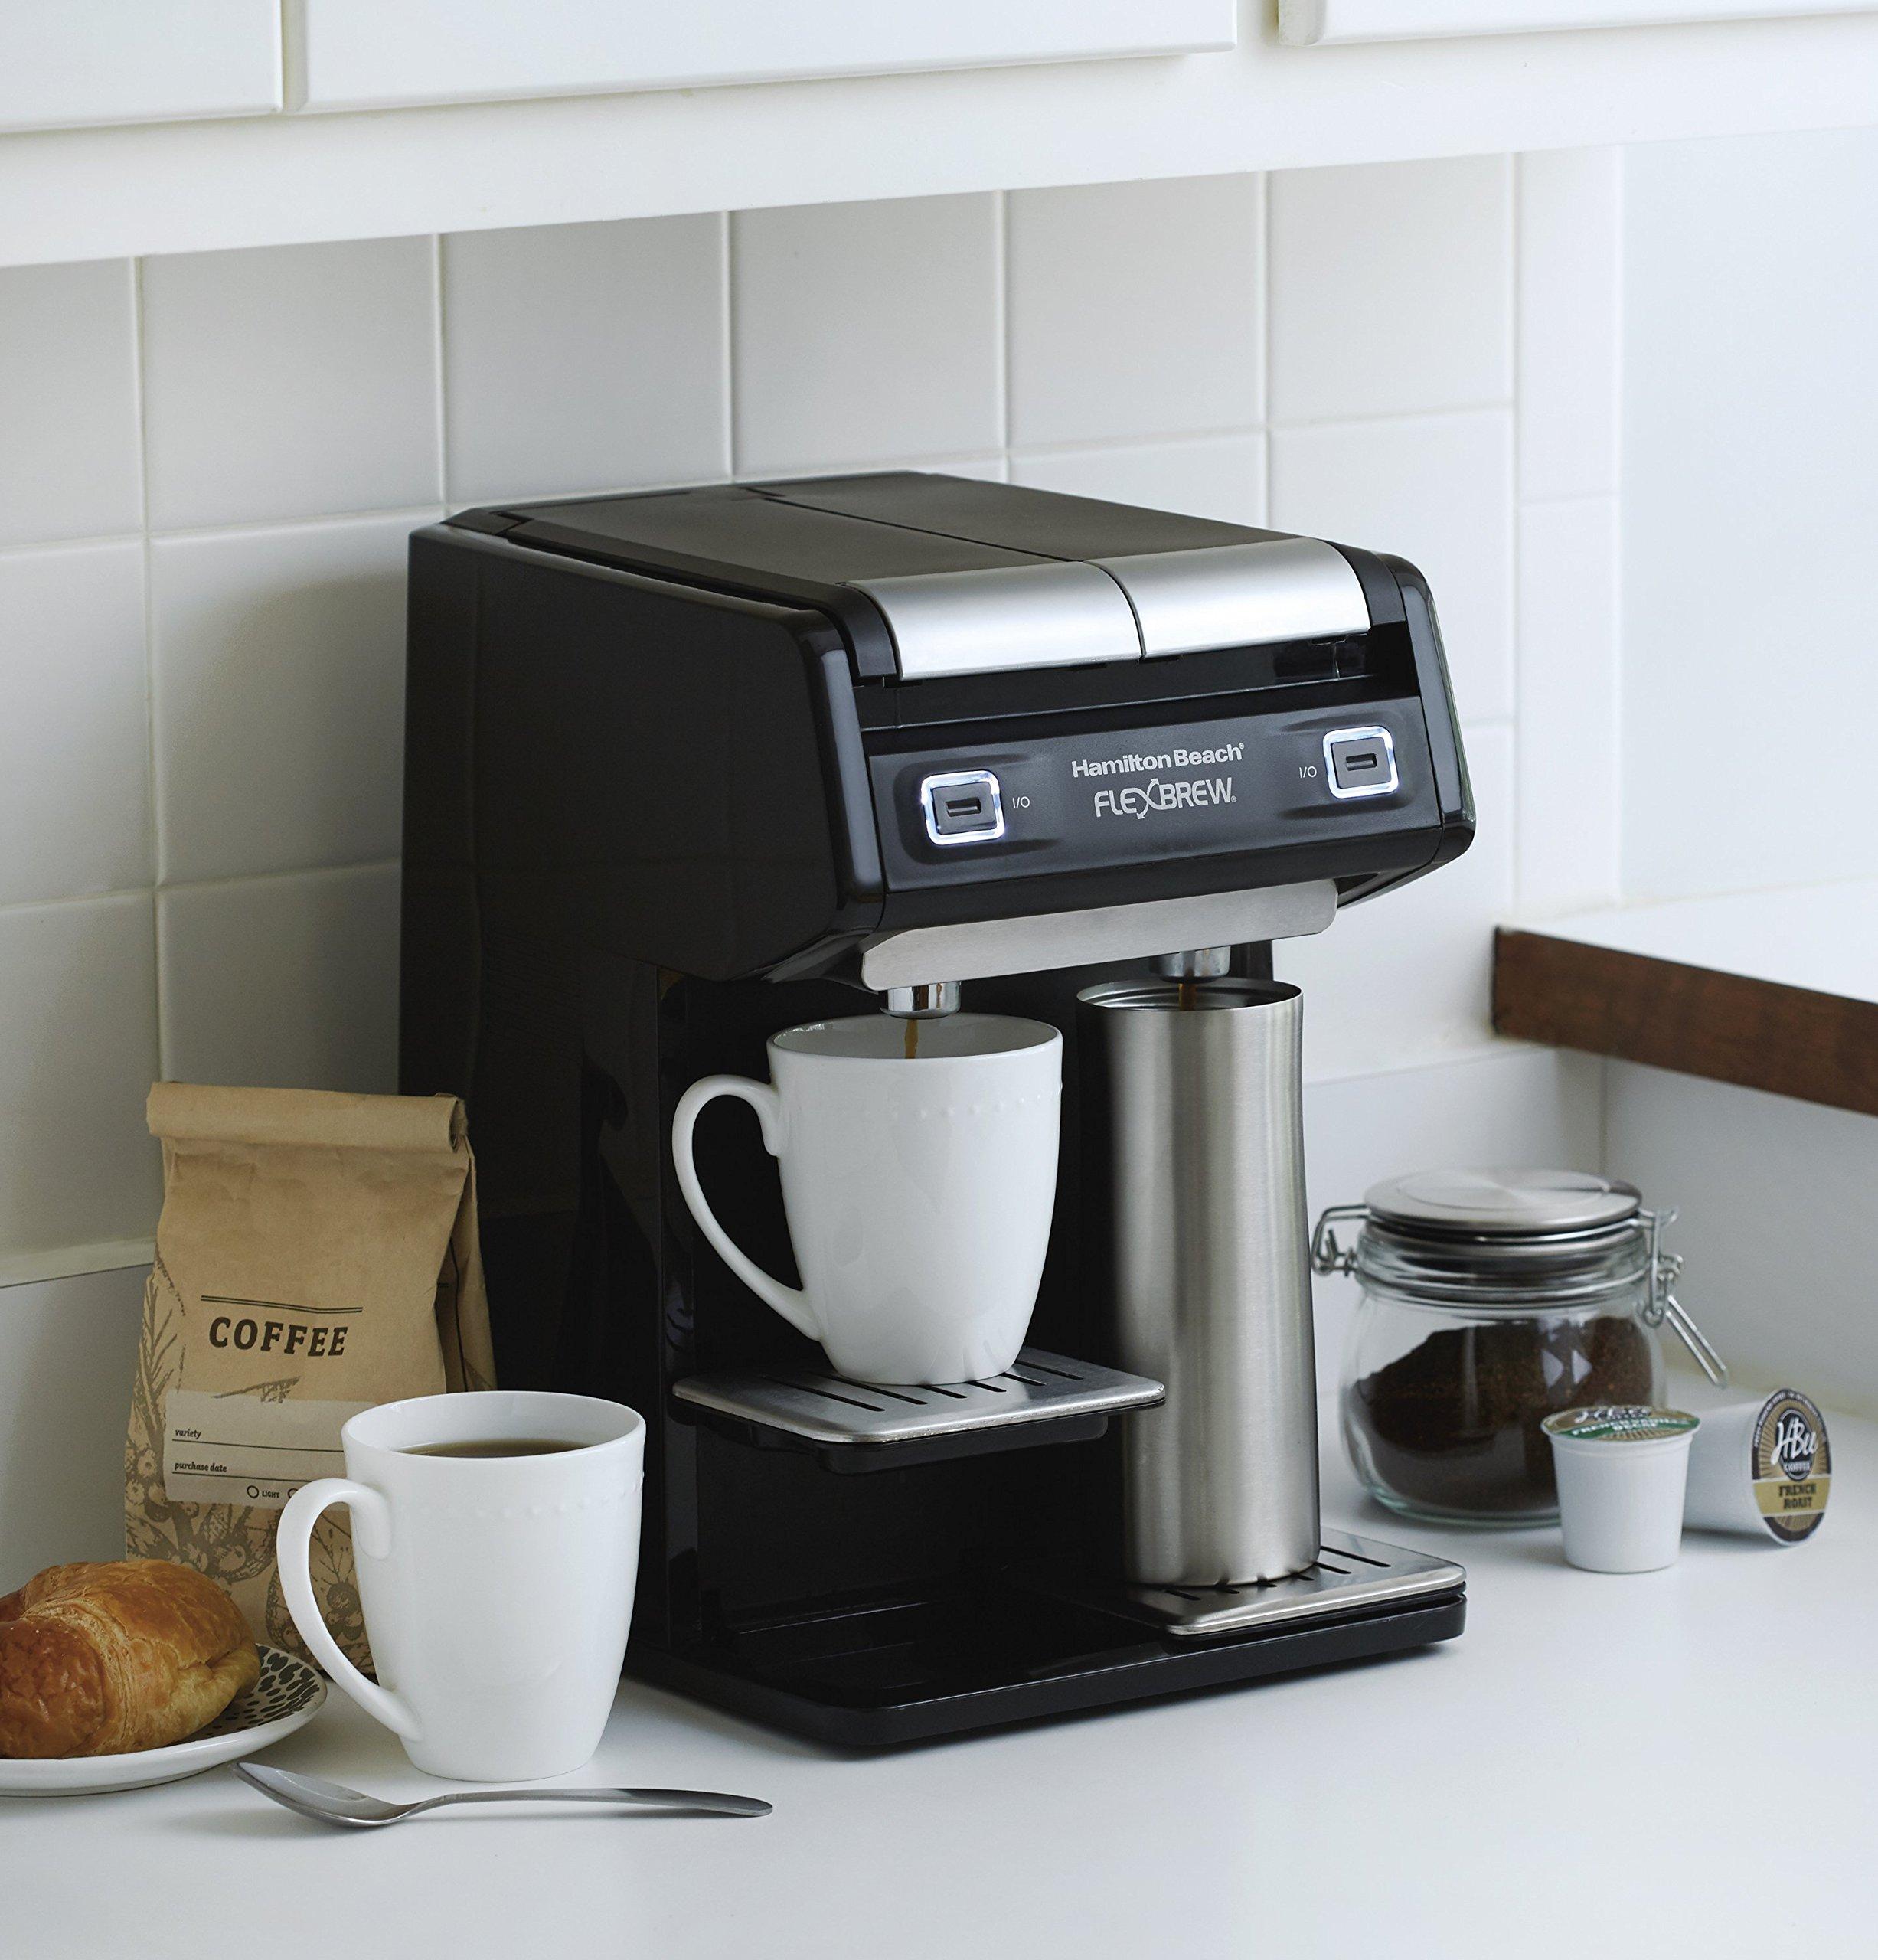 Hamilton Beach 49998 FlexBrew Dual Single Serve Coffee Maker, Black by Hamilton Beach (Image #5)